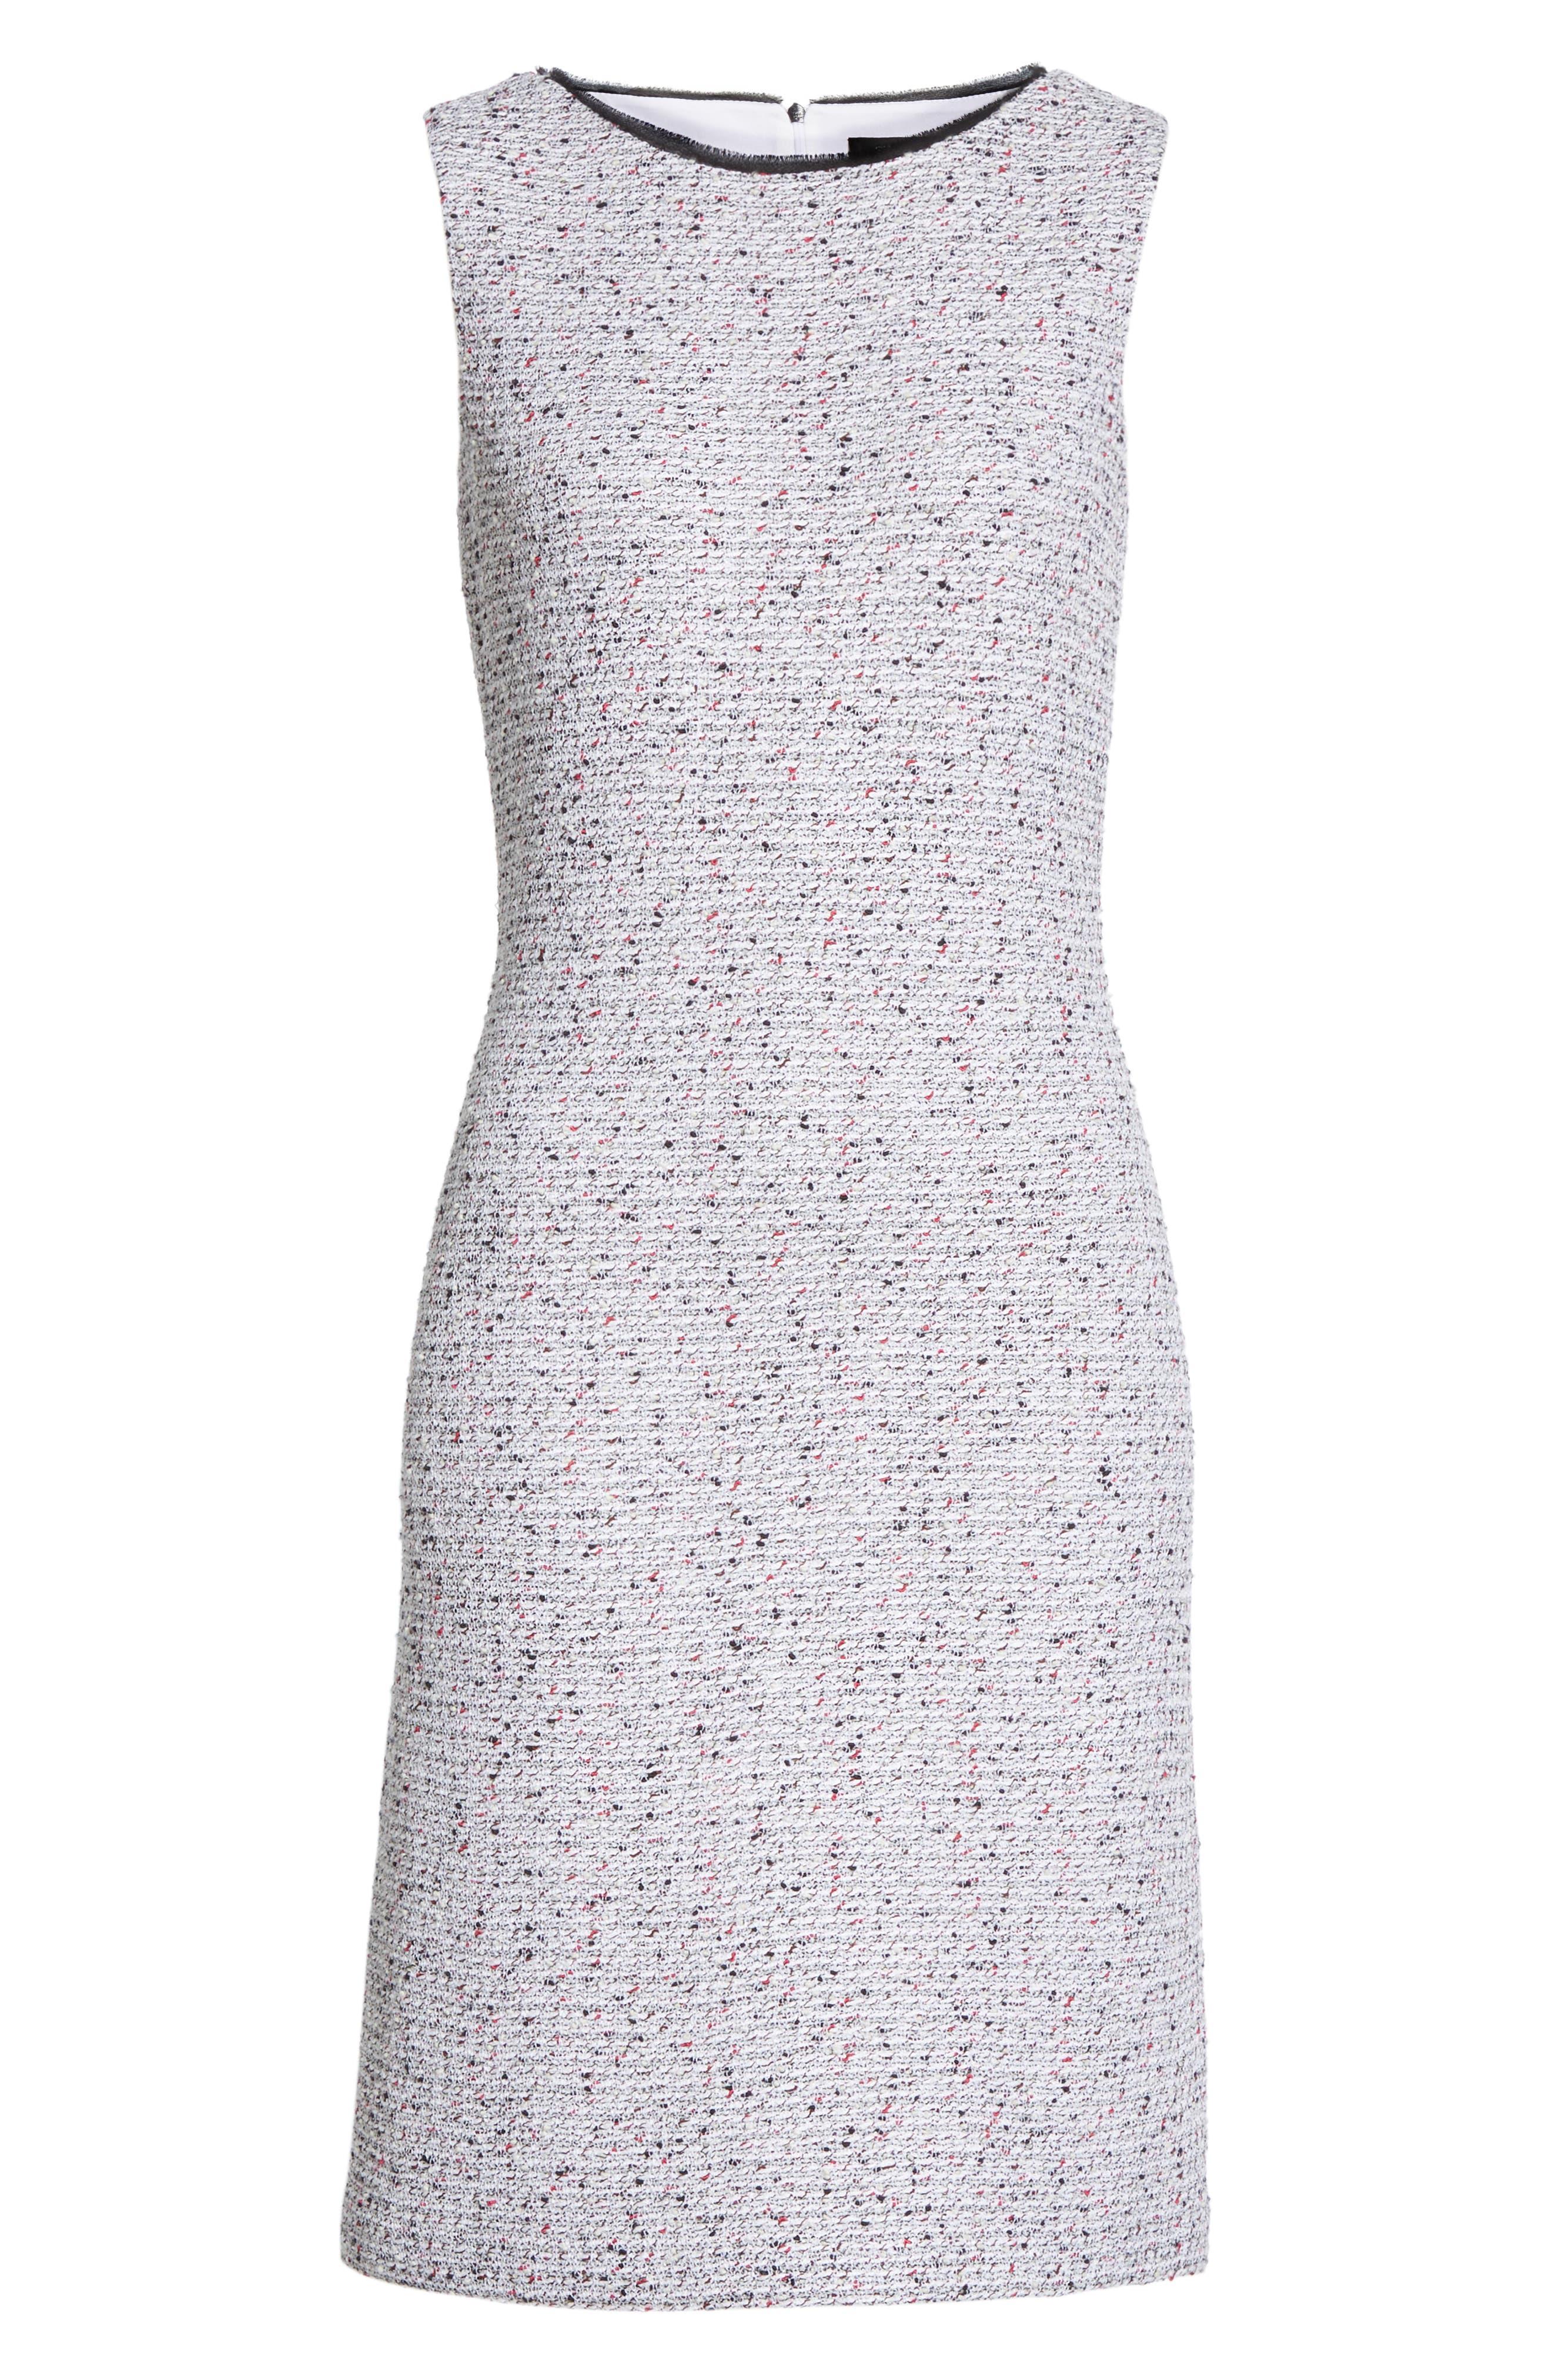 ST. JOHN COLLECTION, Alicia Knit Sheath Dress, Alternate thumbnail 7, color, WHITE/ FLAMINGO MULTI